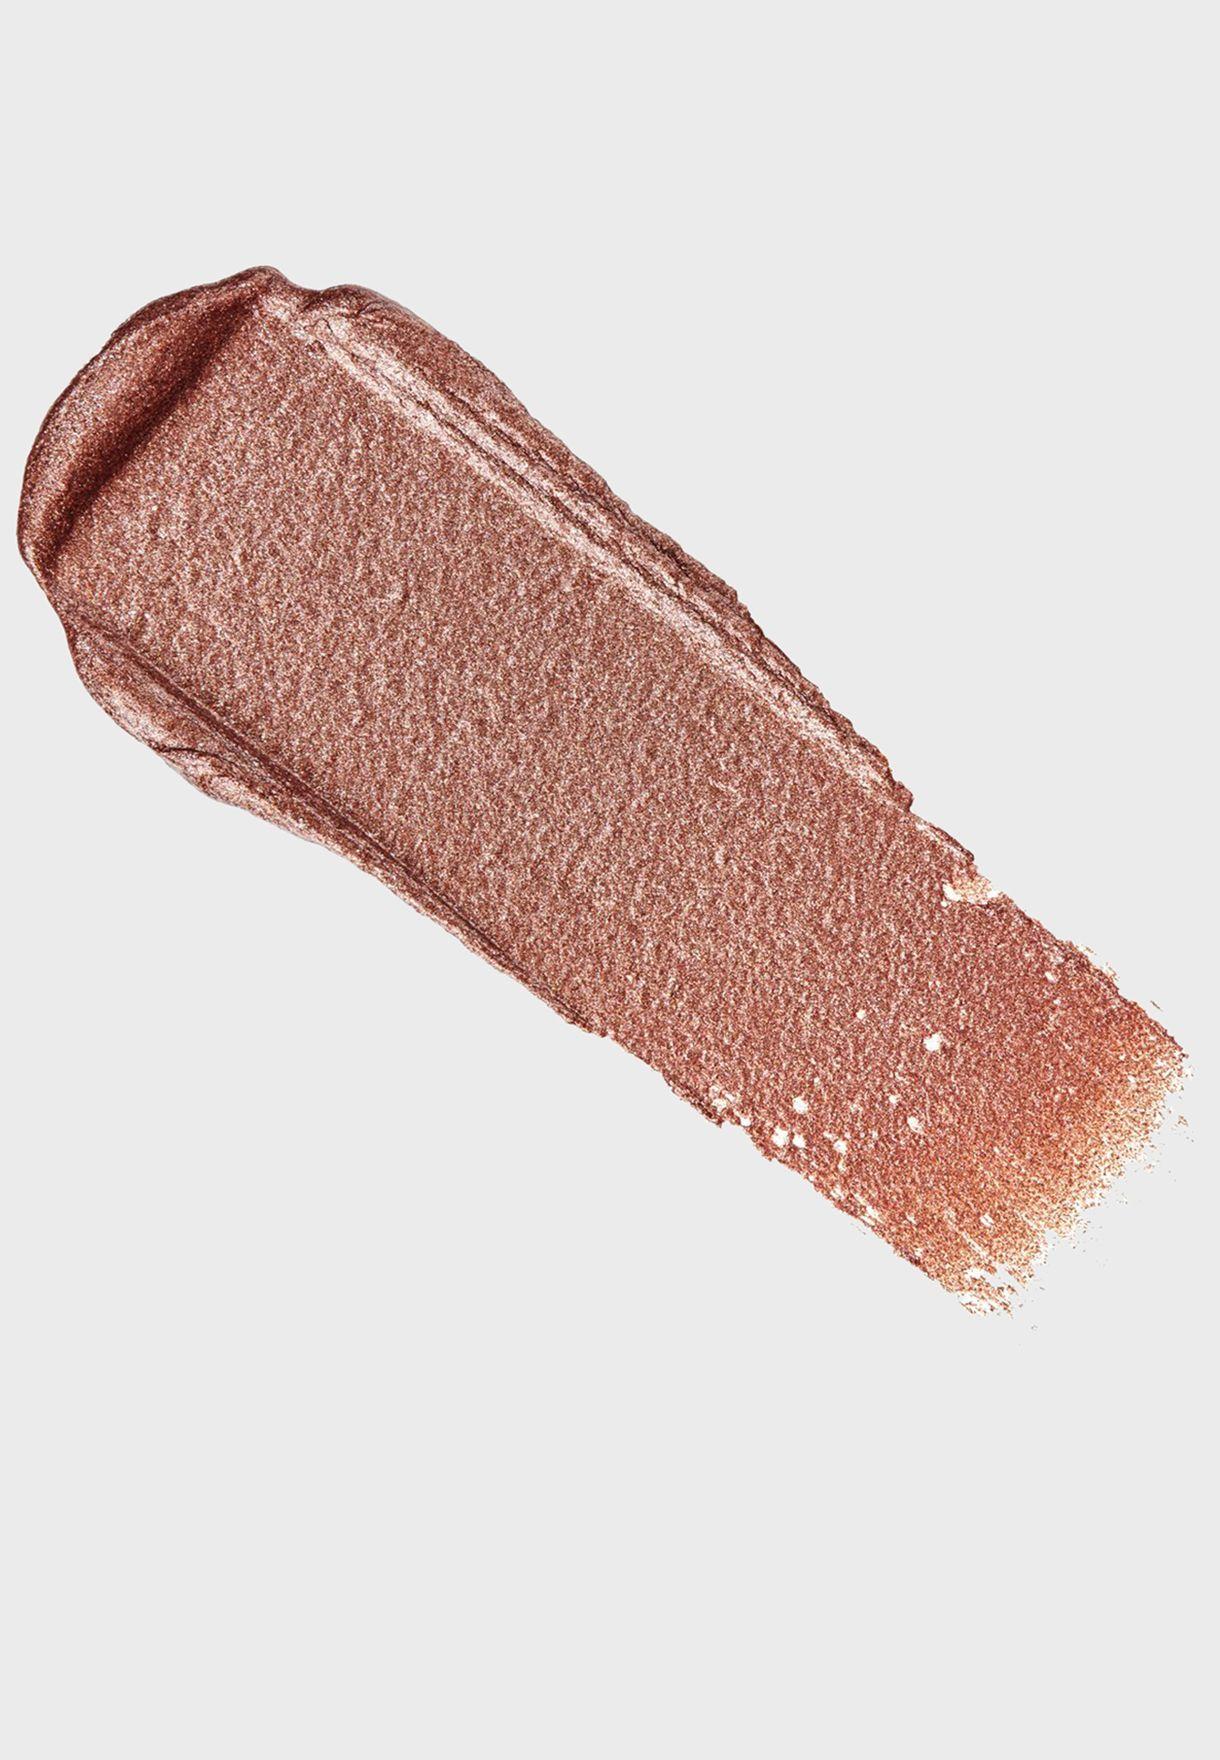 Ultra Glow Crème Eyeshadow - Copper